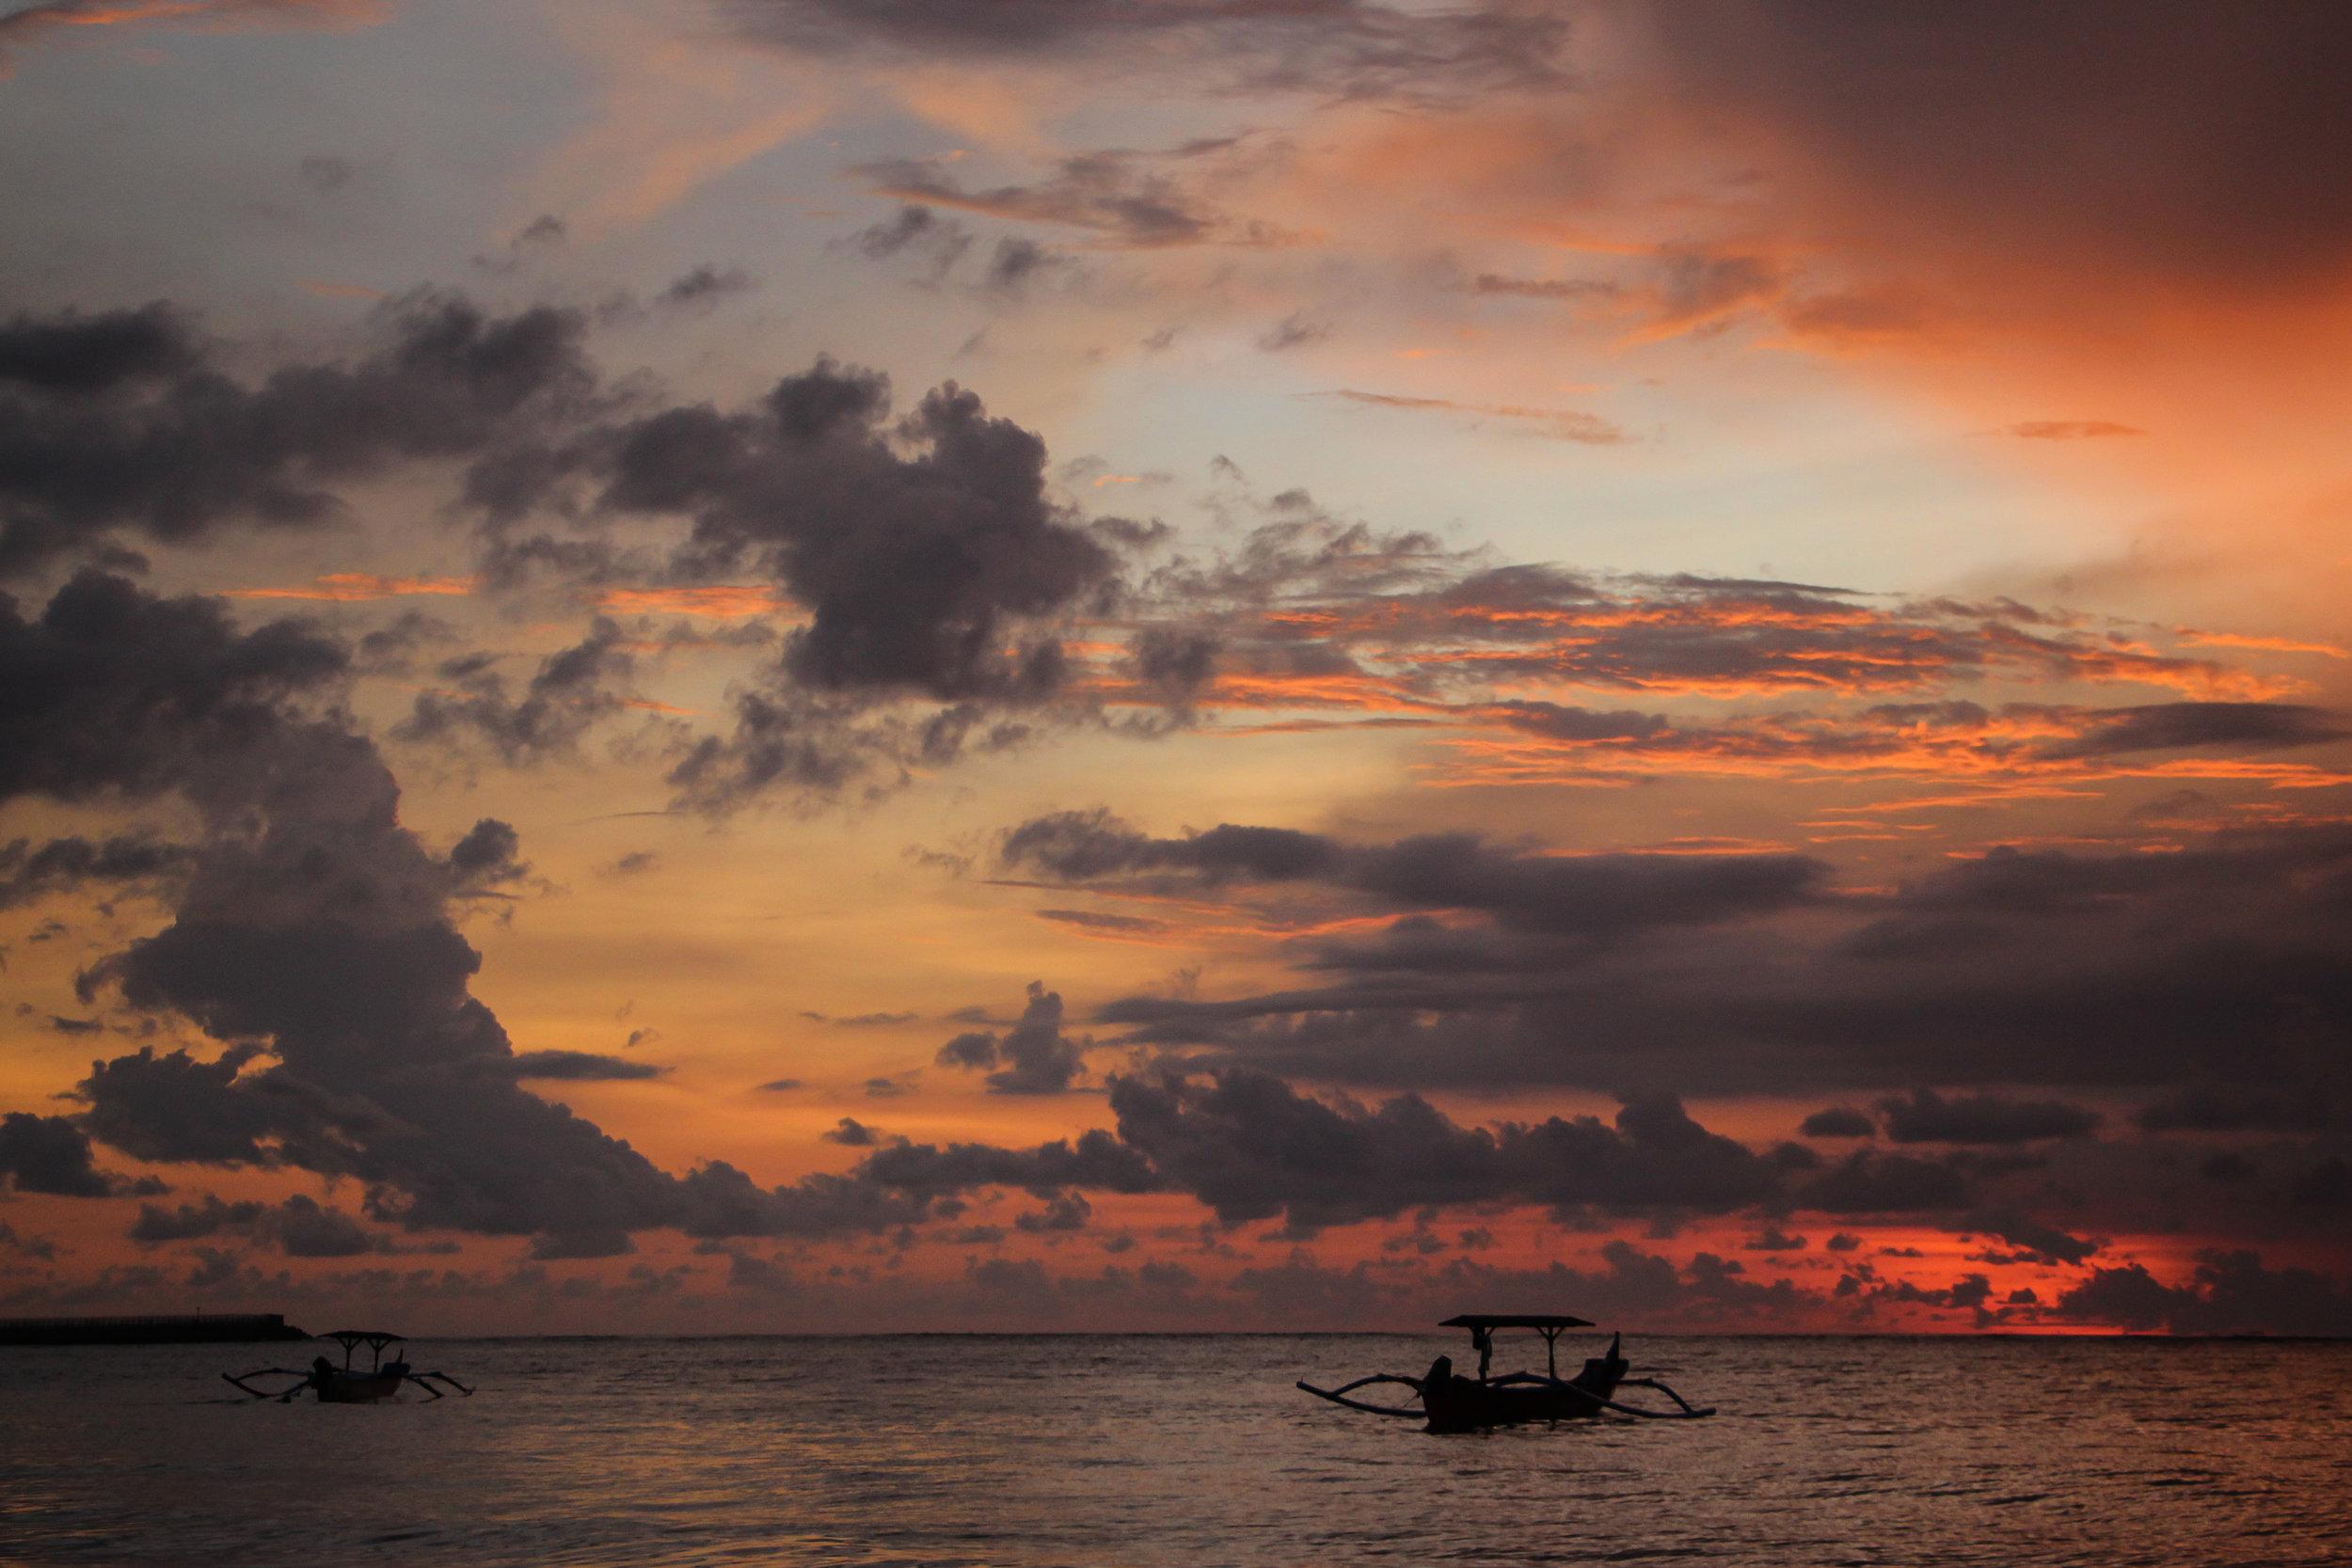 sunset, sky, beach, sea, fishing boat, Bali, Indonesia, Asia | DoLessGetMoreDone.com |